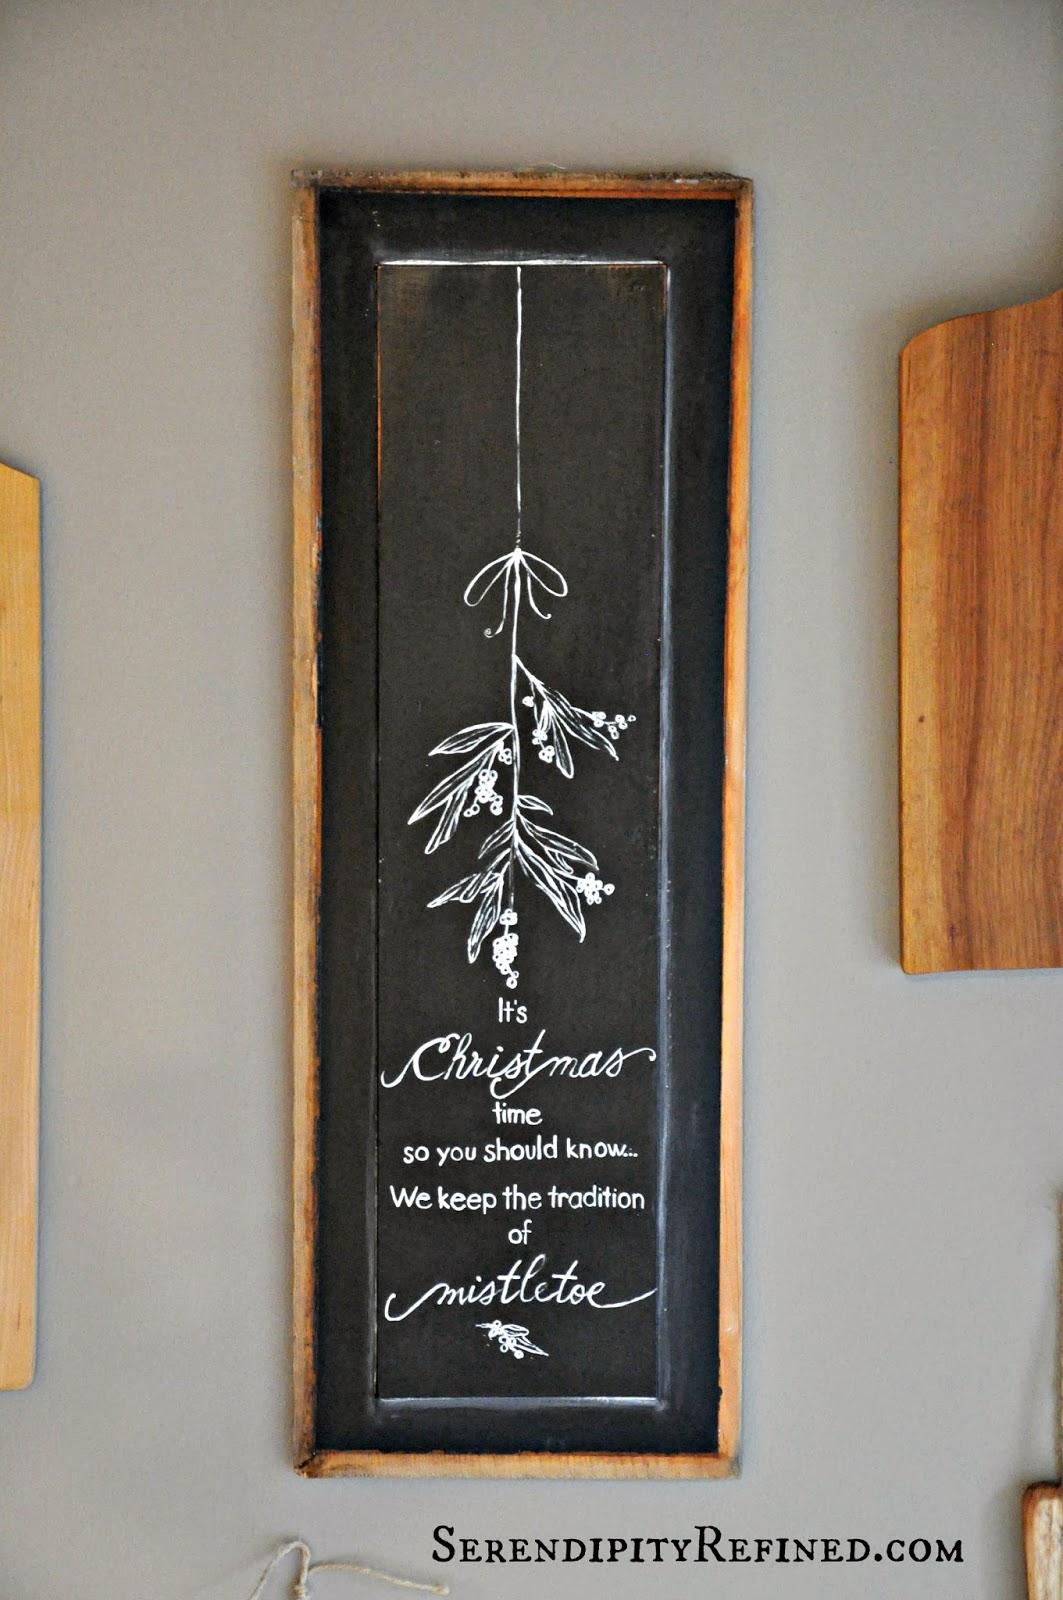 Serendipity Refined Blog: Christmas Chalkboard Wall Art